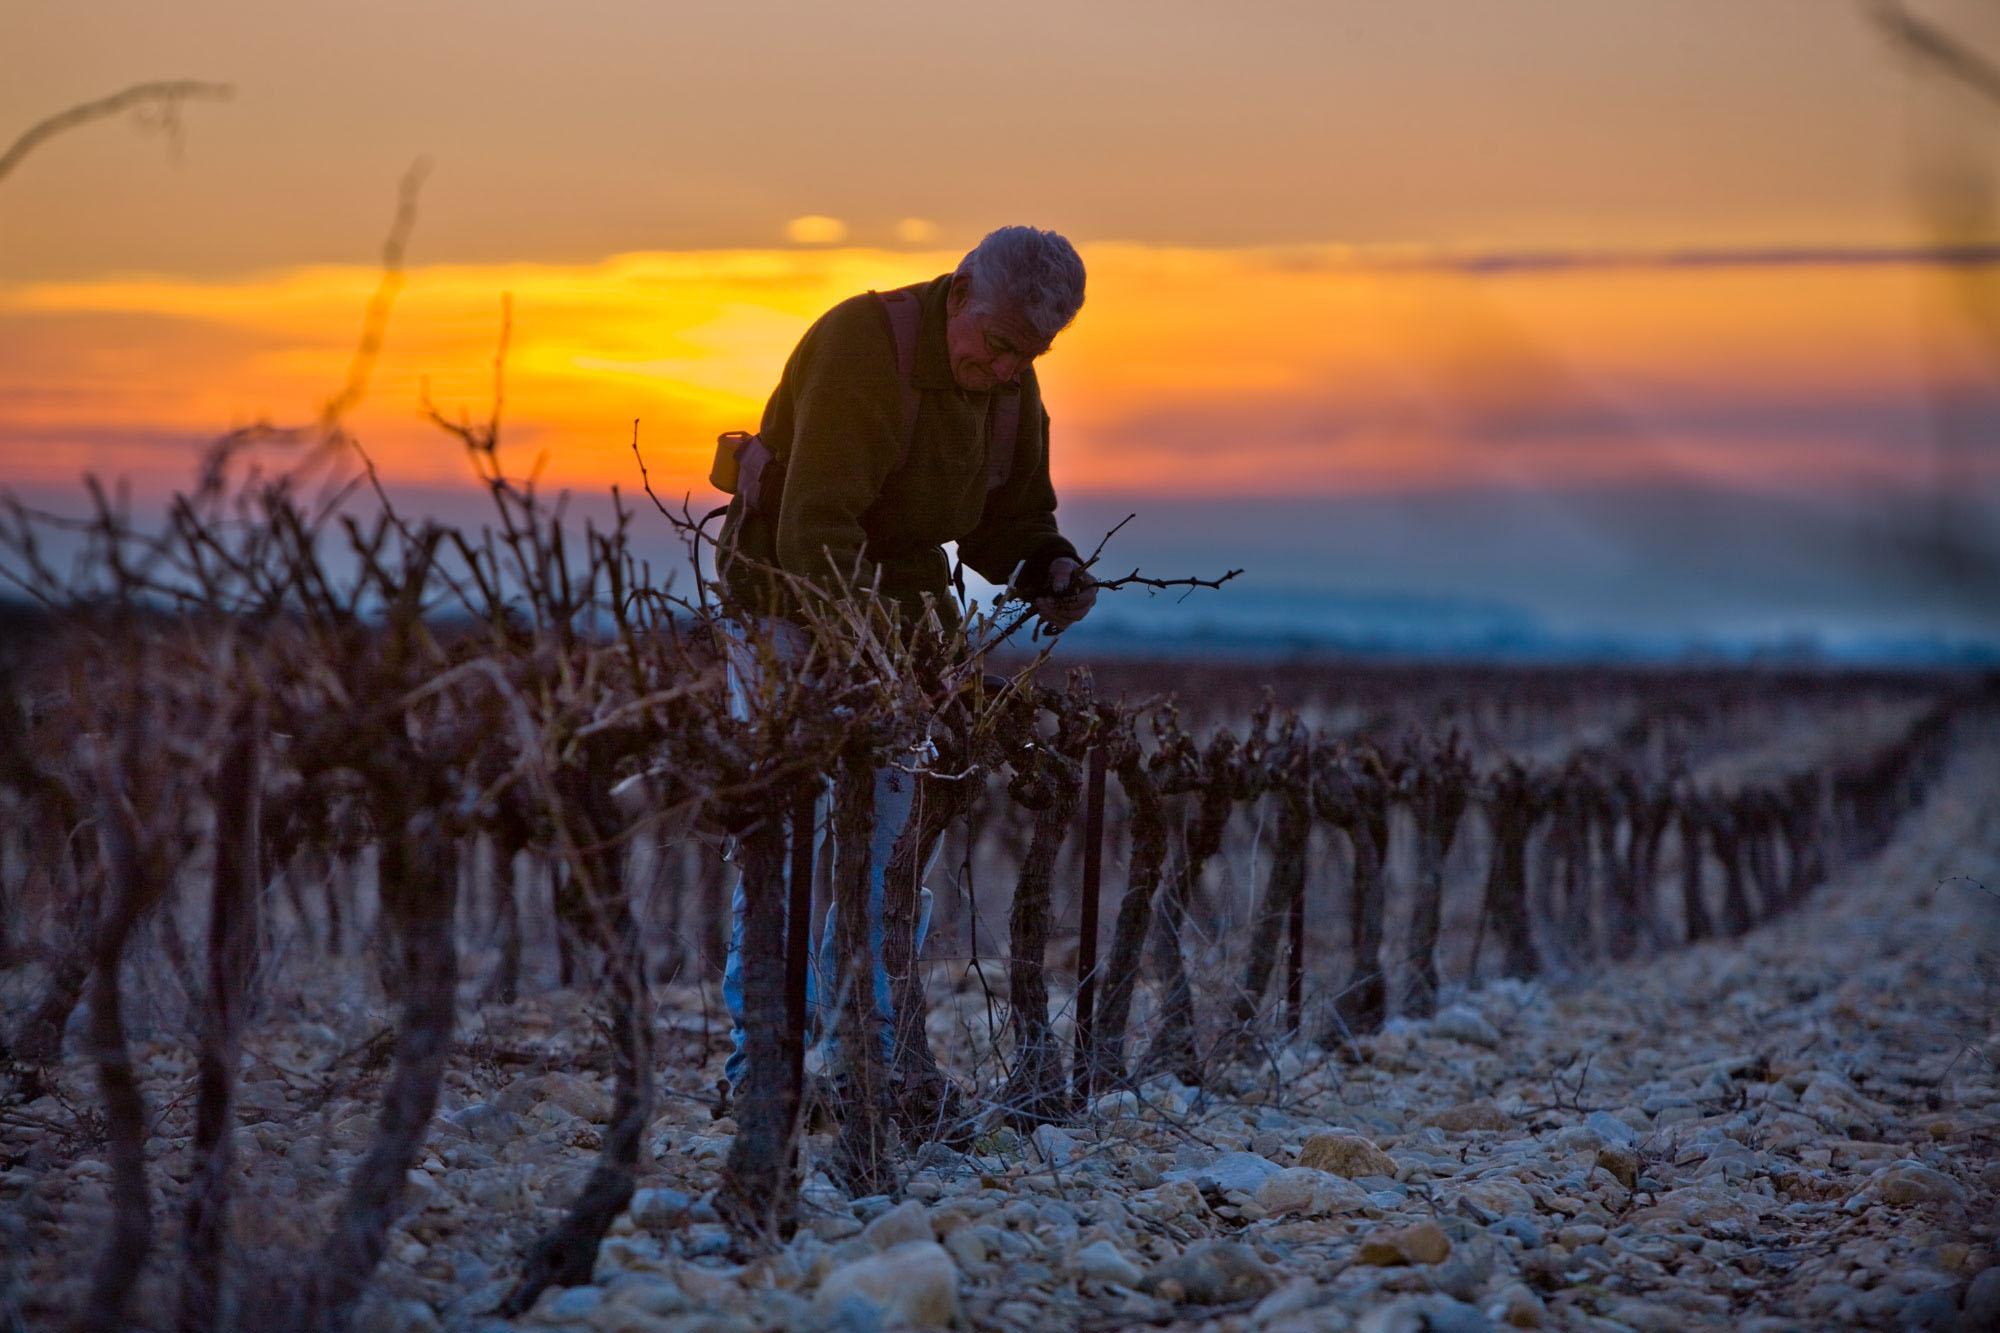 winegrower in vineyard, sunset